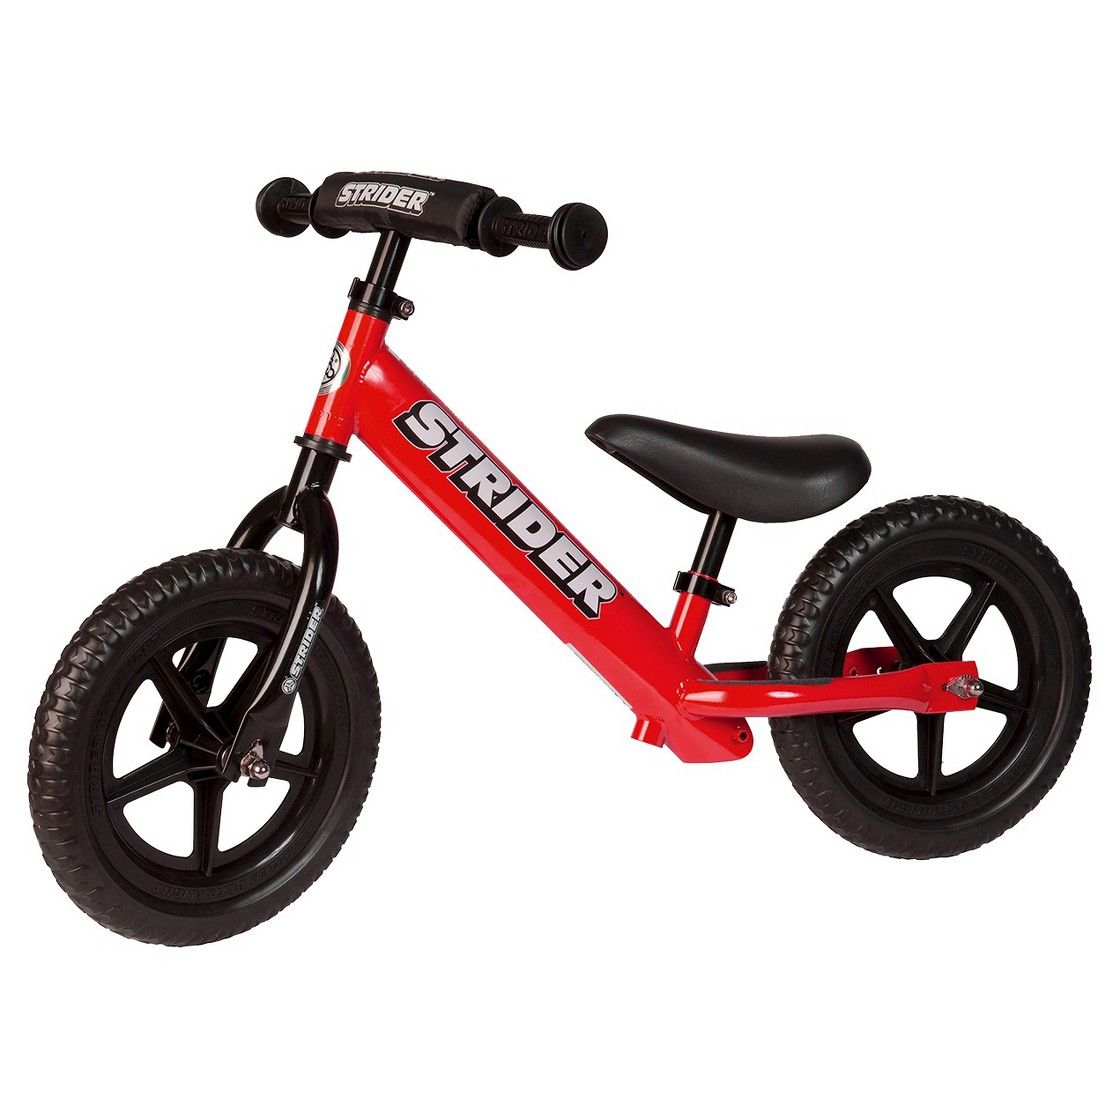 STRIDER 12 Sport NoPedal Balance Bike Red Balance bike